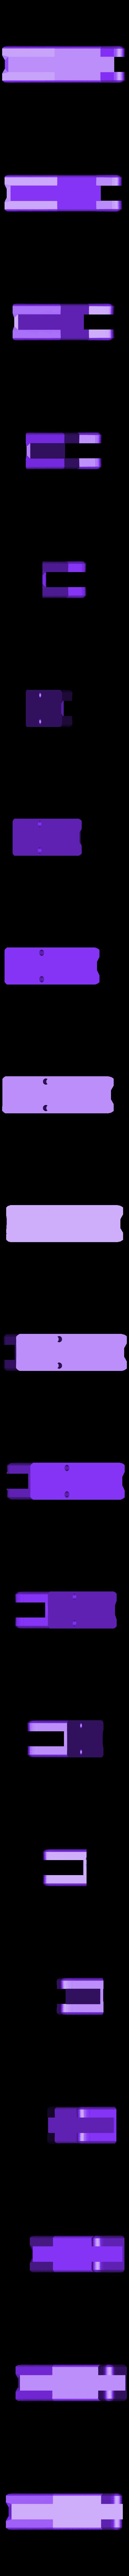 Lightcycle_Body_Bottom.STL Download free STL file Lightcycle Model Kit • Design to 3D print, billythemighty3Dprinter